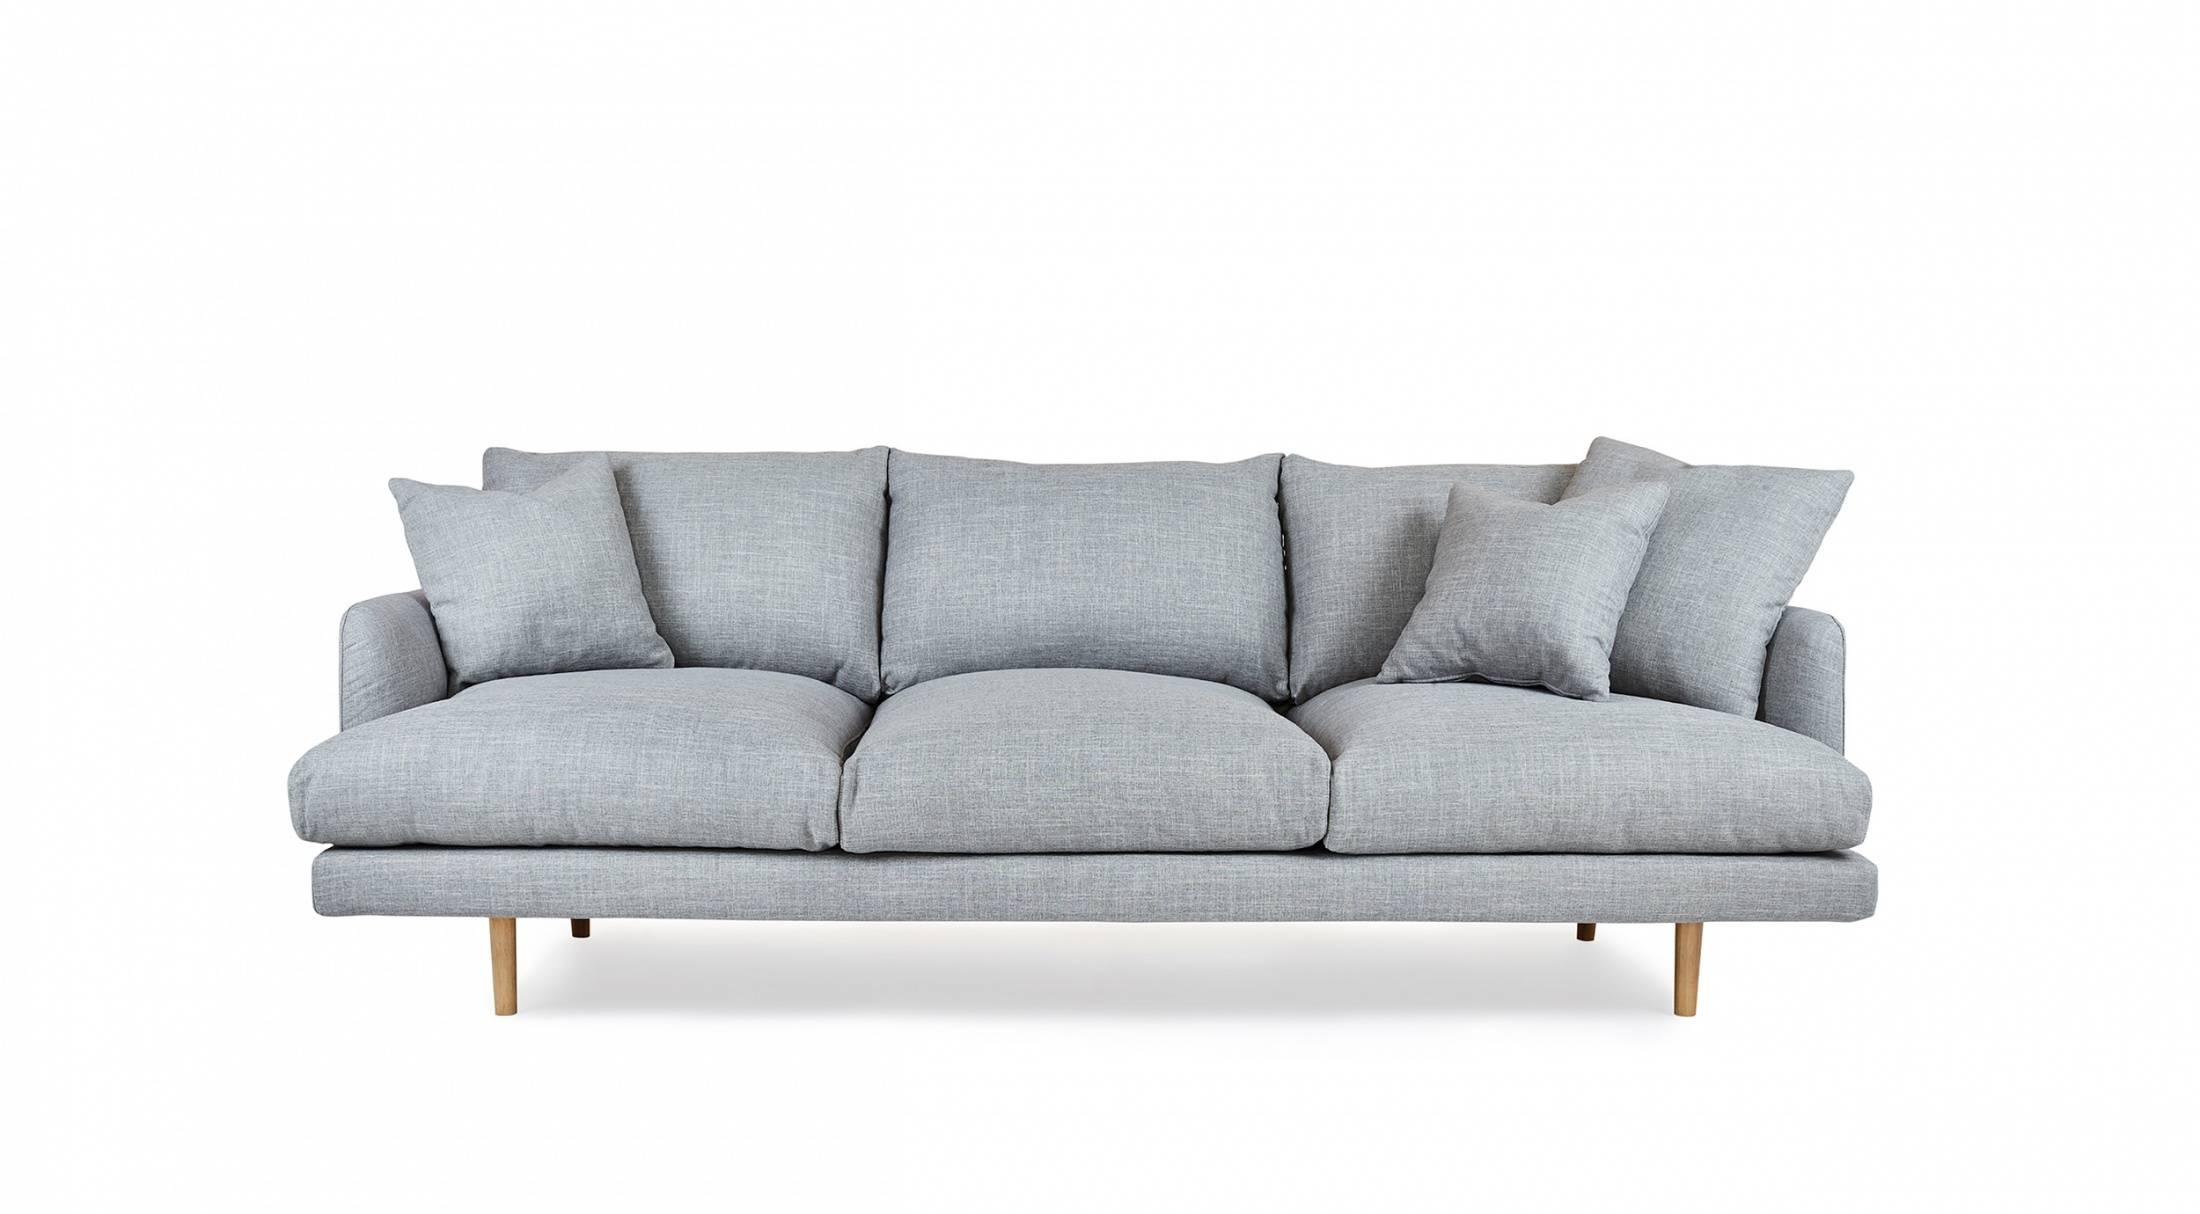 Hampton - 4 Seat Sofa | Loungelovers with regard to 4 Seat Sofas (Image 18 of 30)